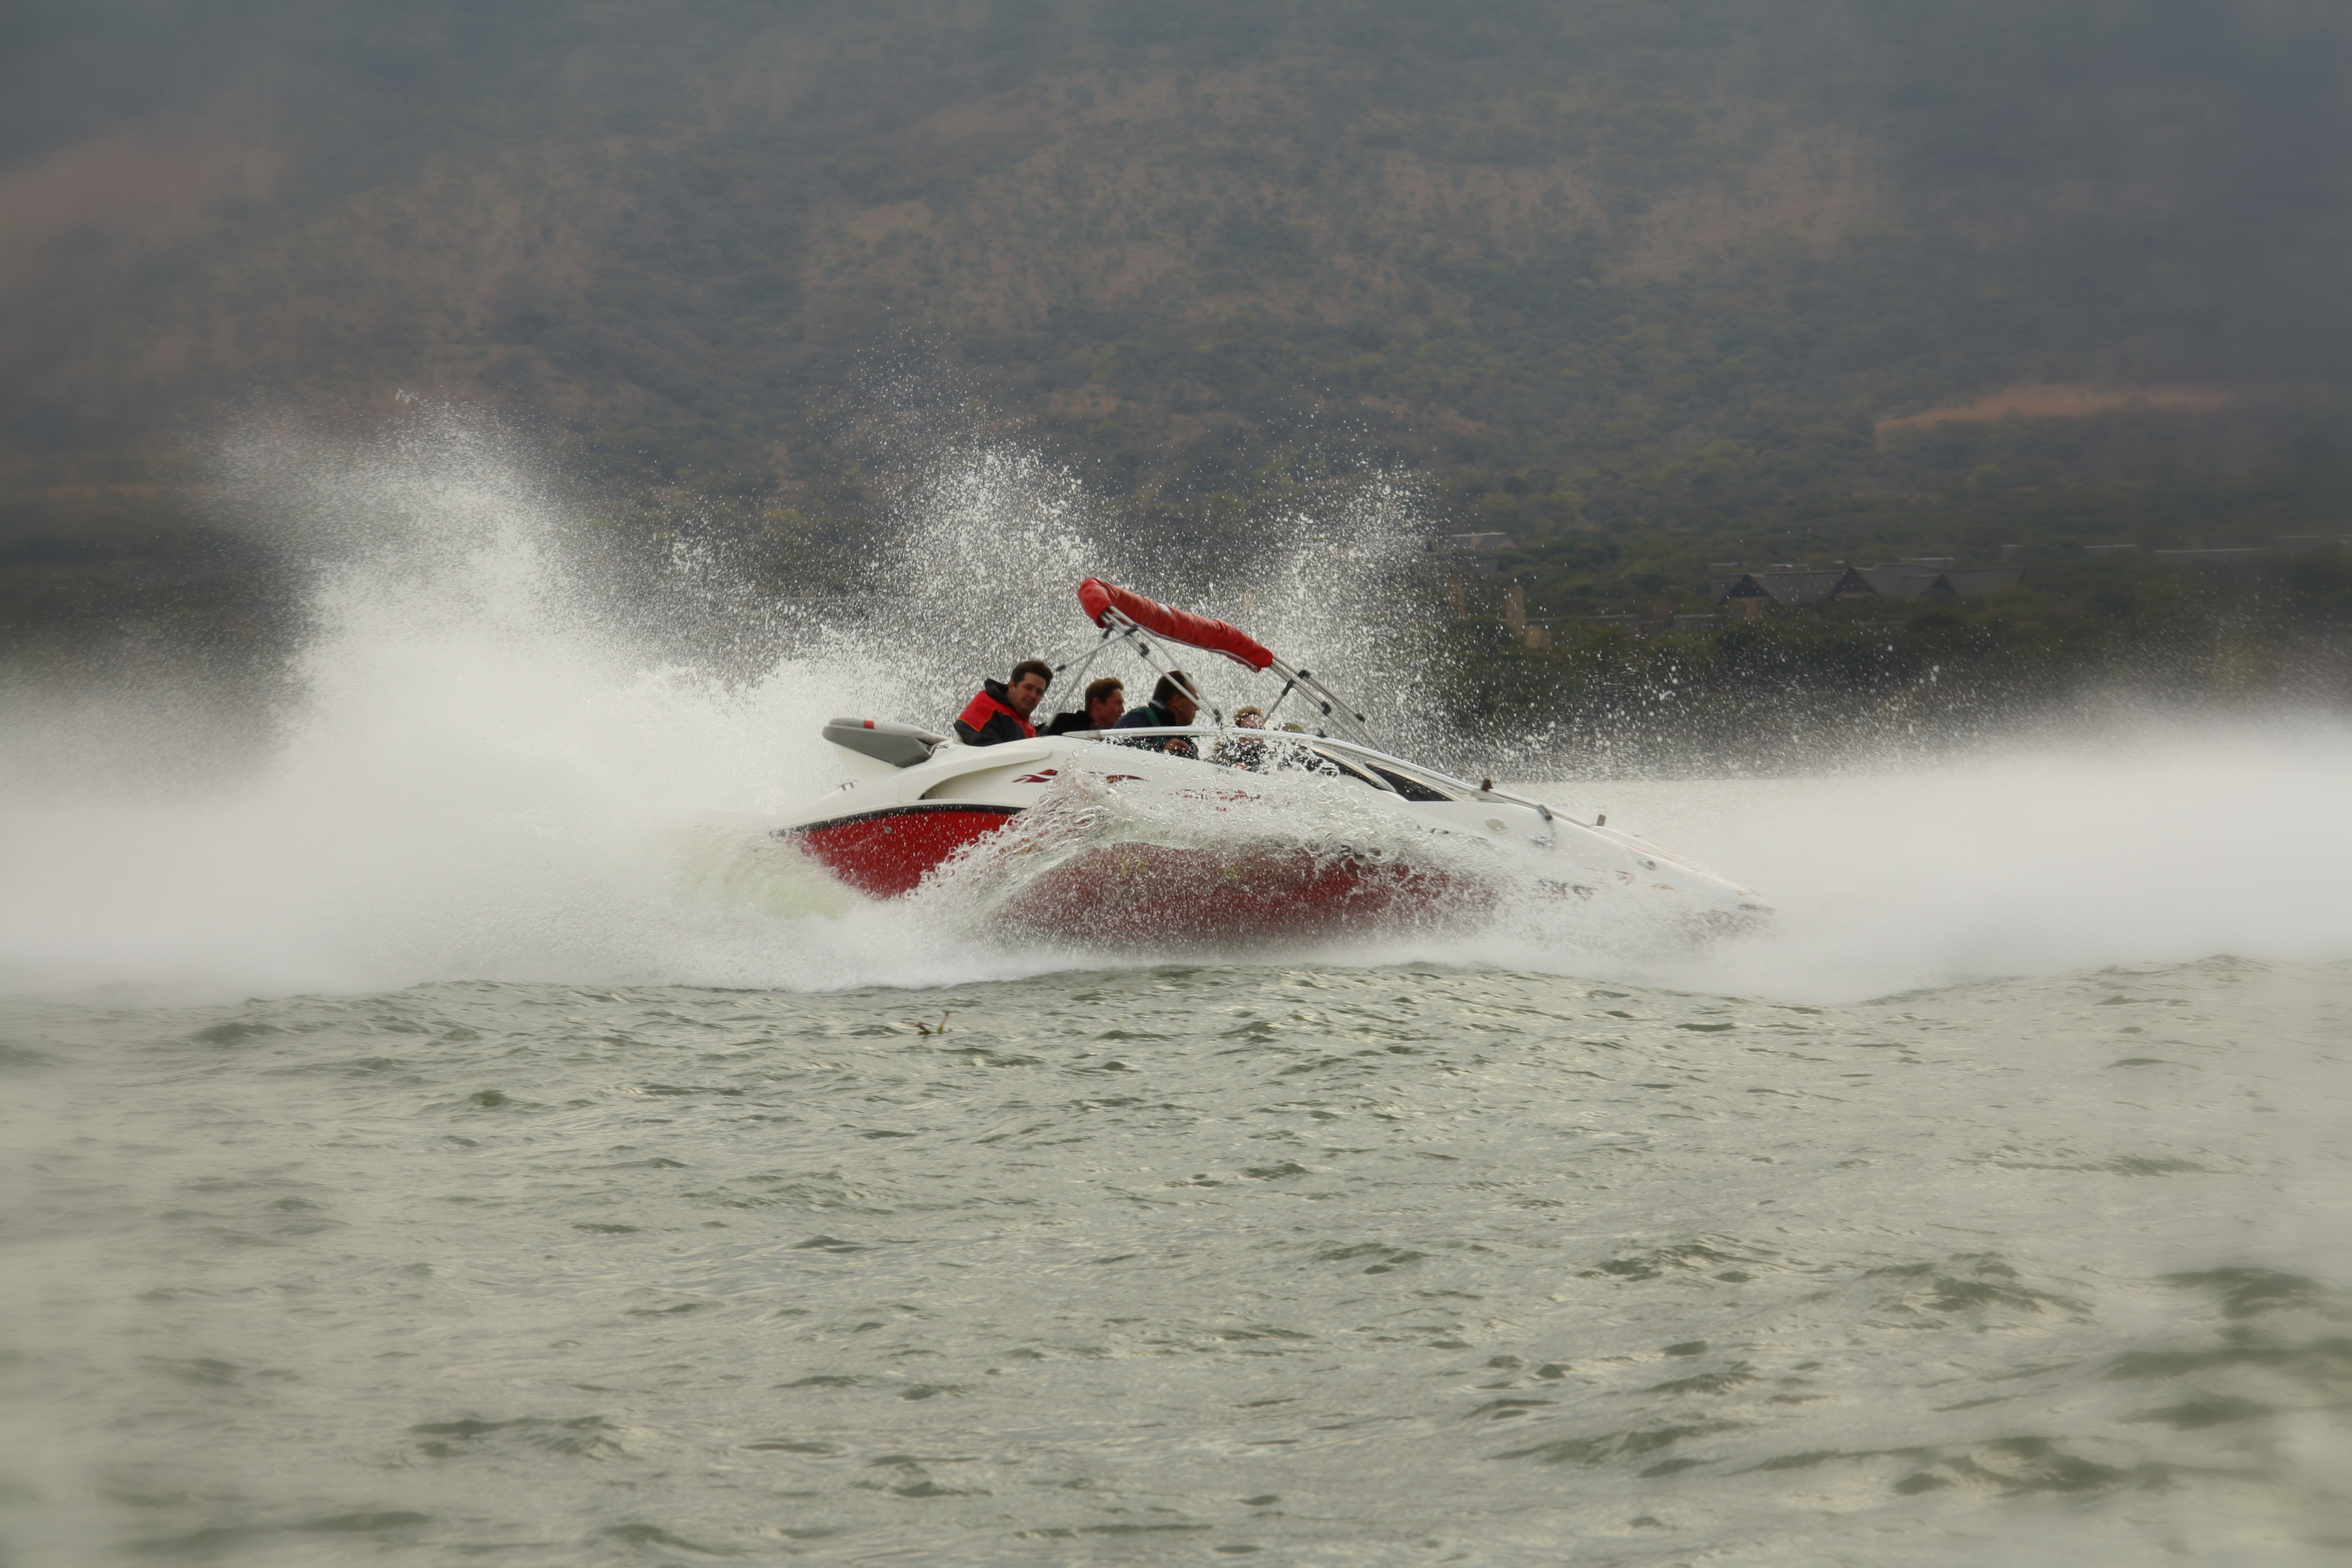 Images of Jet Boat Freaks